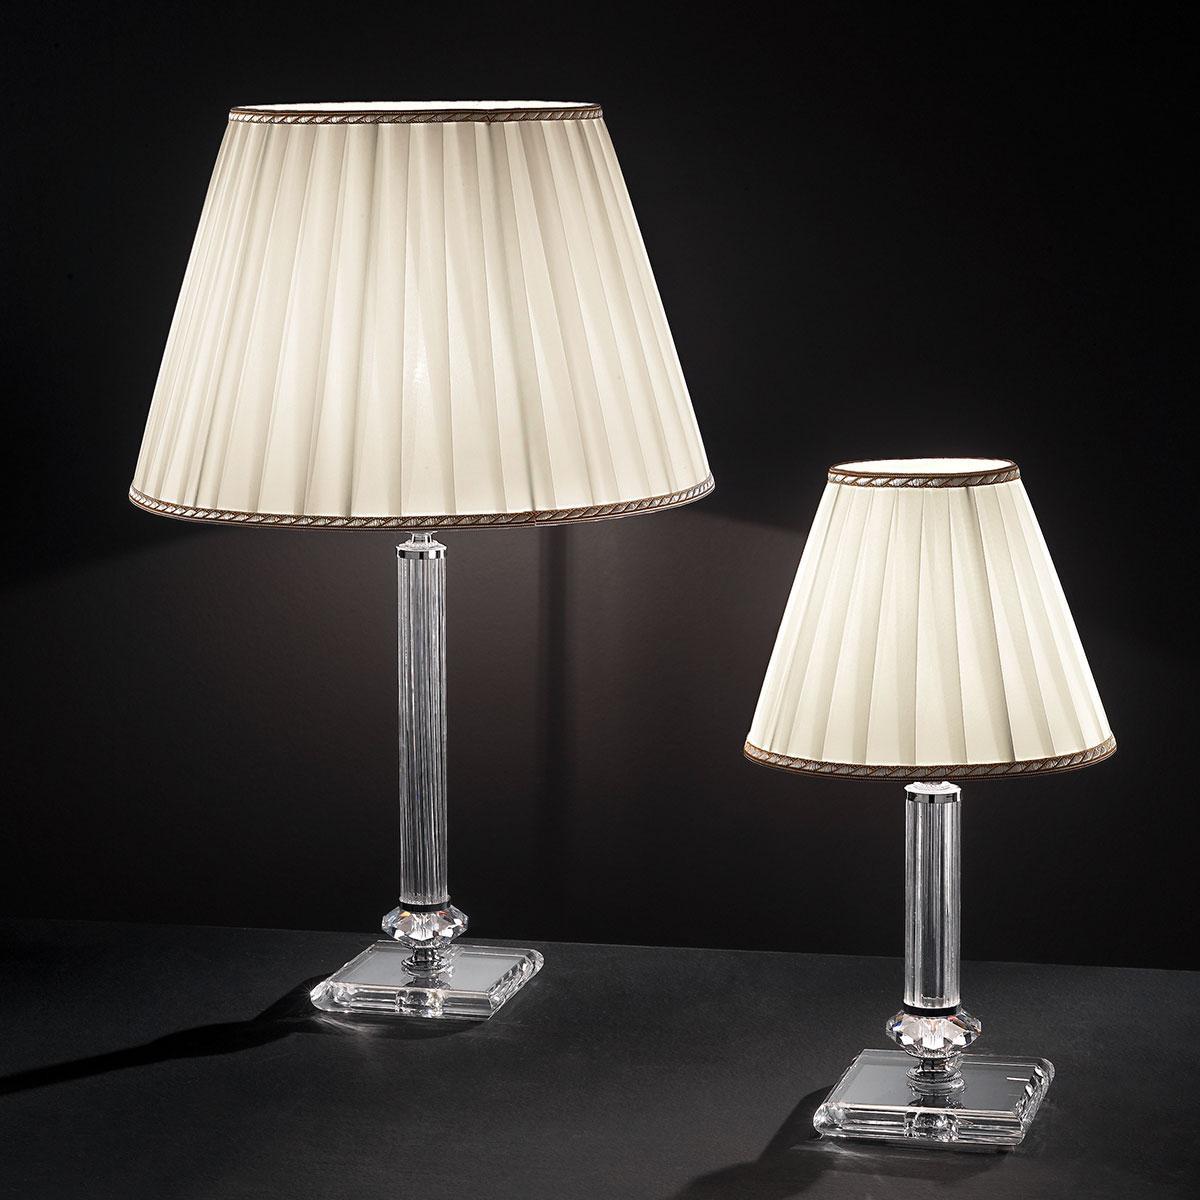 """Altamura"" lampara de sobremesa veneciana en cristal - 1 luce - transparente"